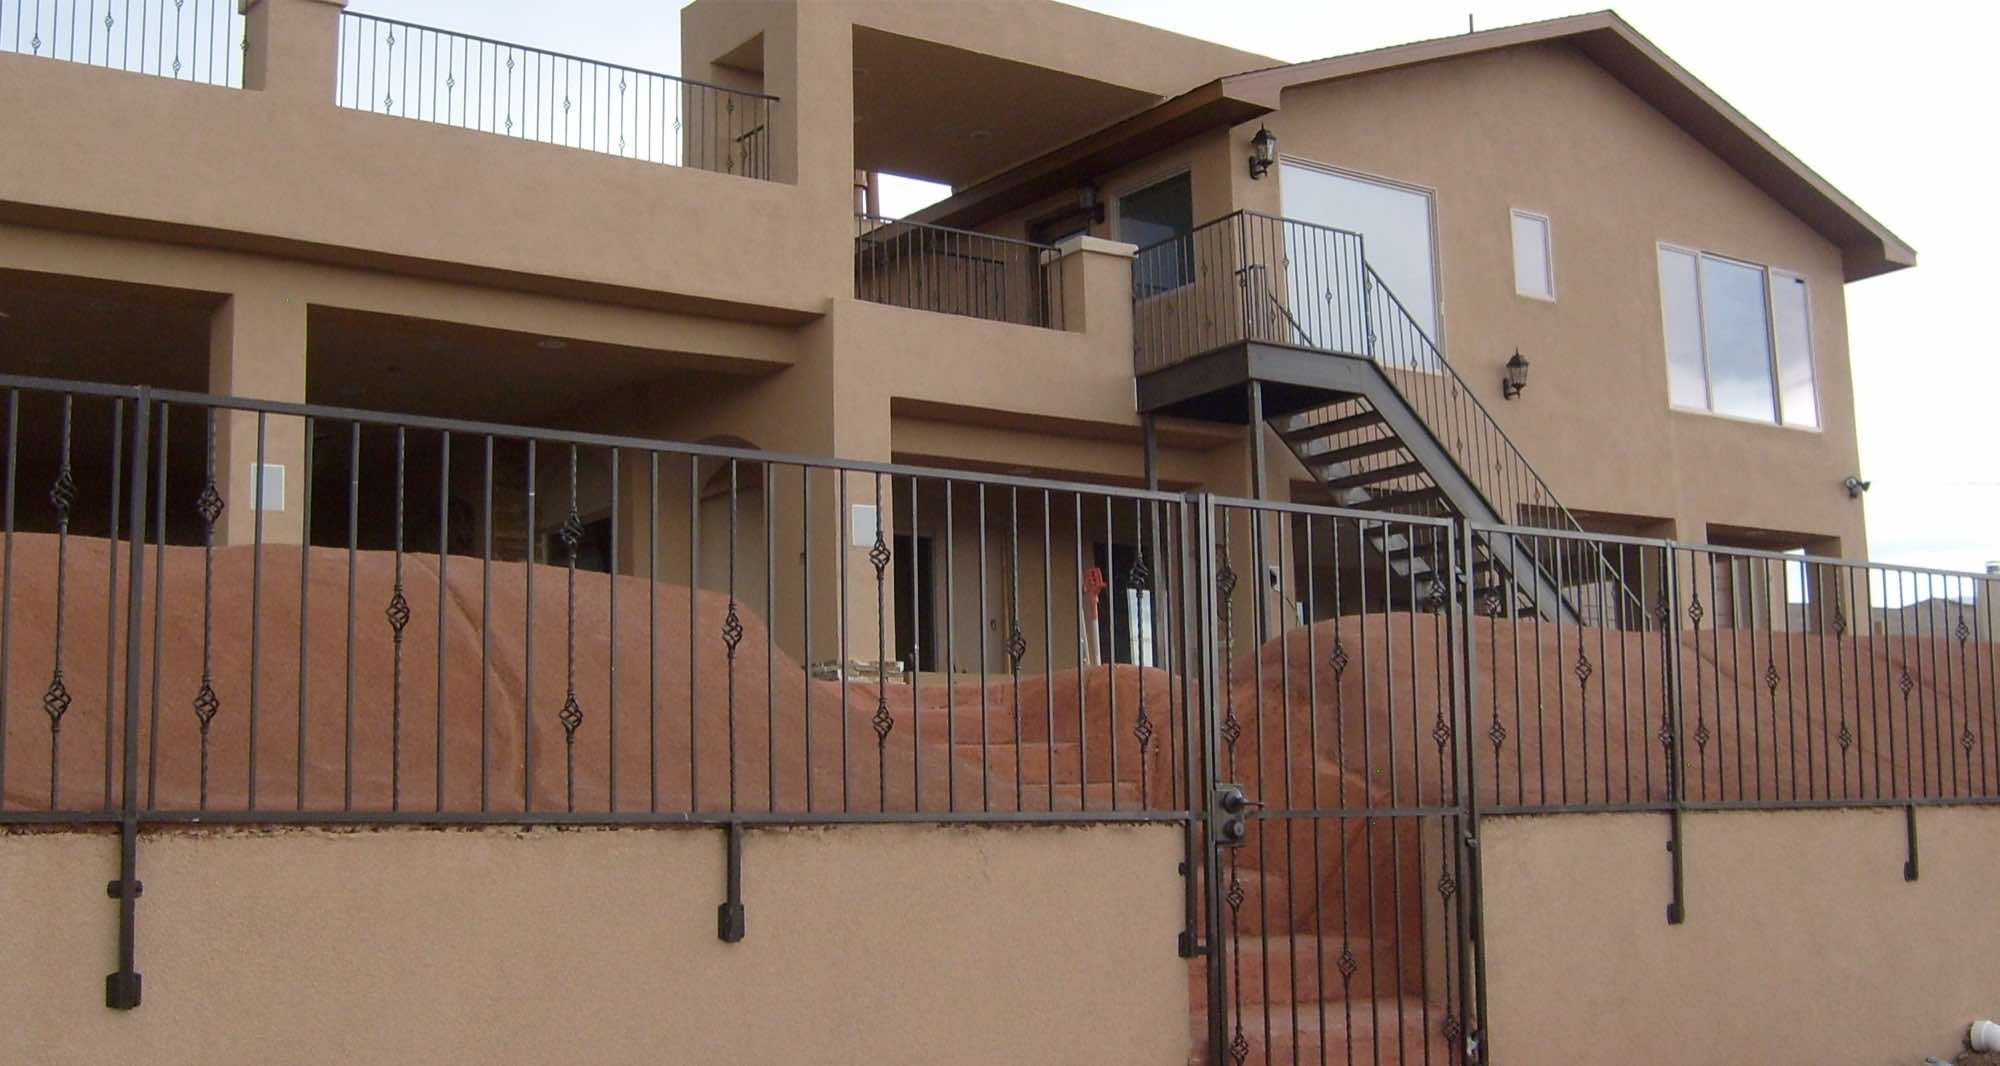 Balcony Rail 7